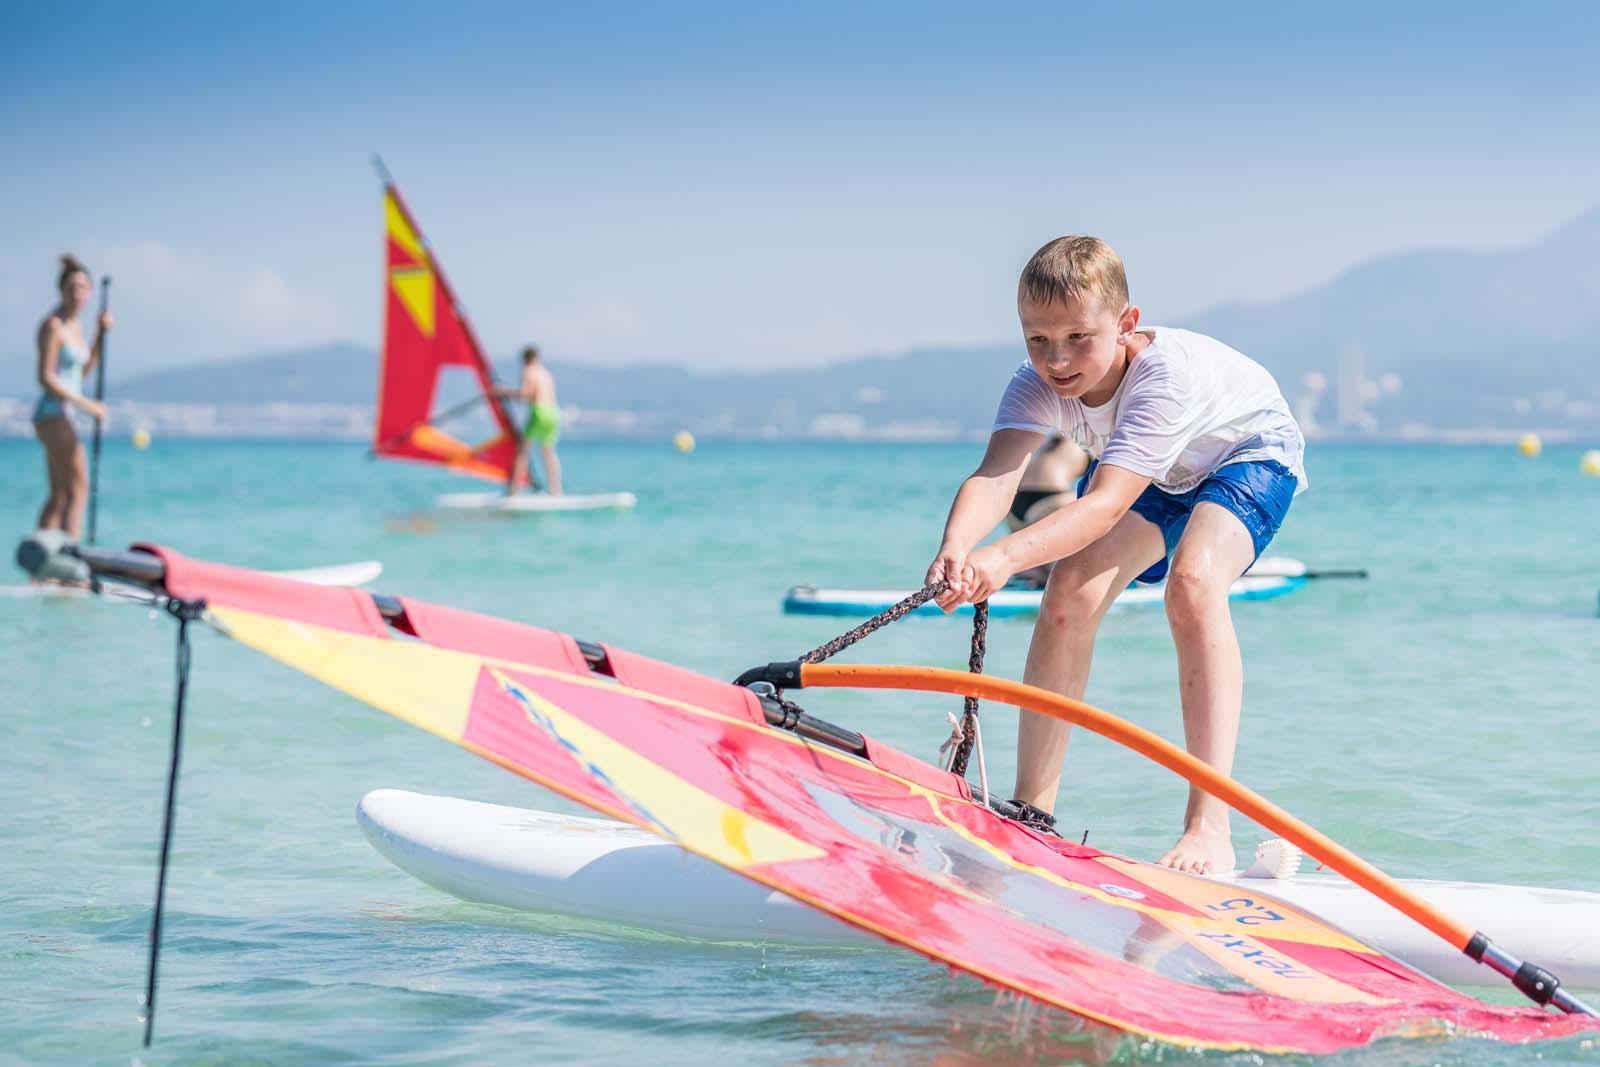 windsurfing beginner course for children school of windsurfing in